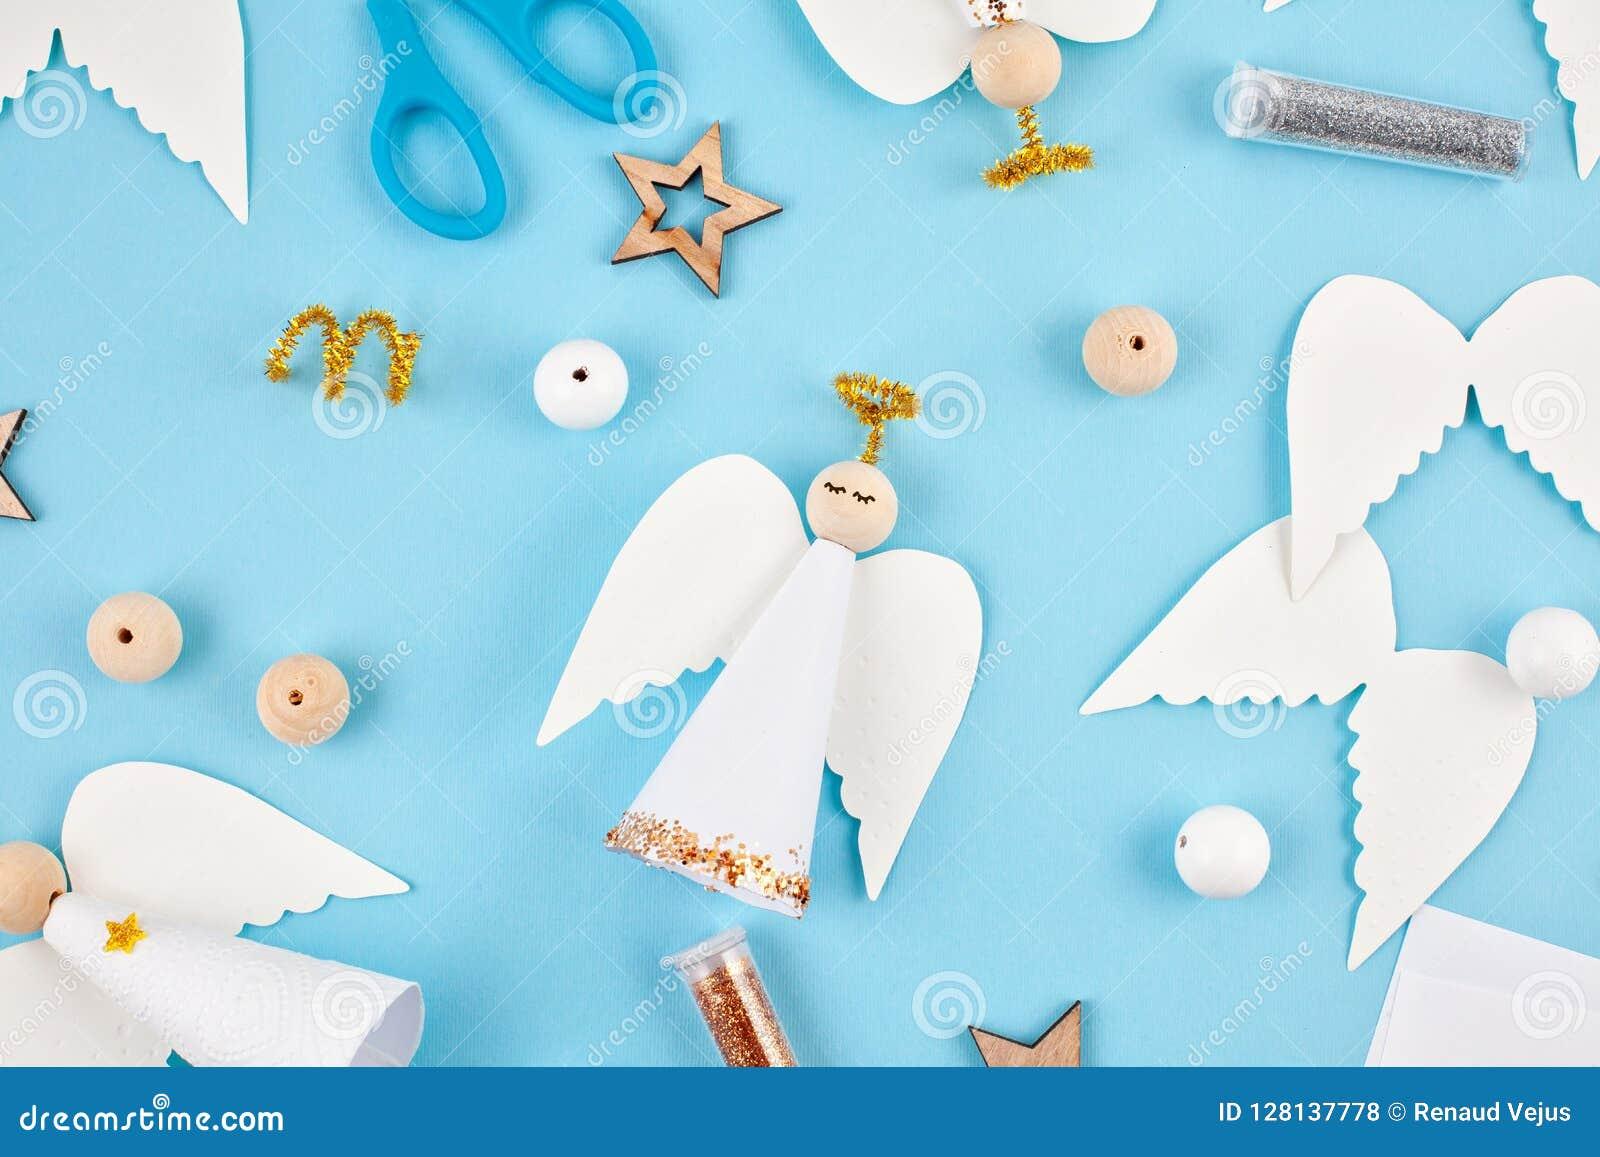 Creative Hobby Diy Christmas Decoration Process Of Making Hand